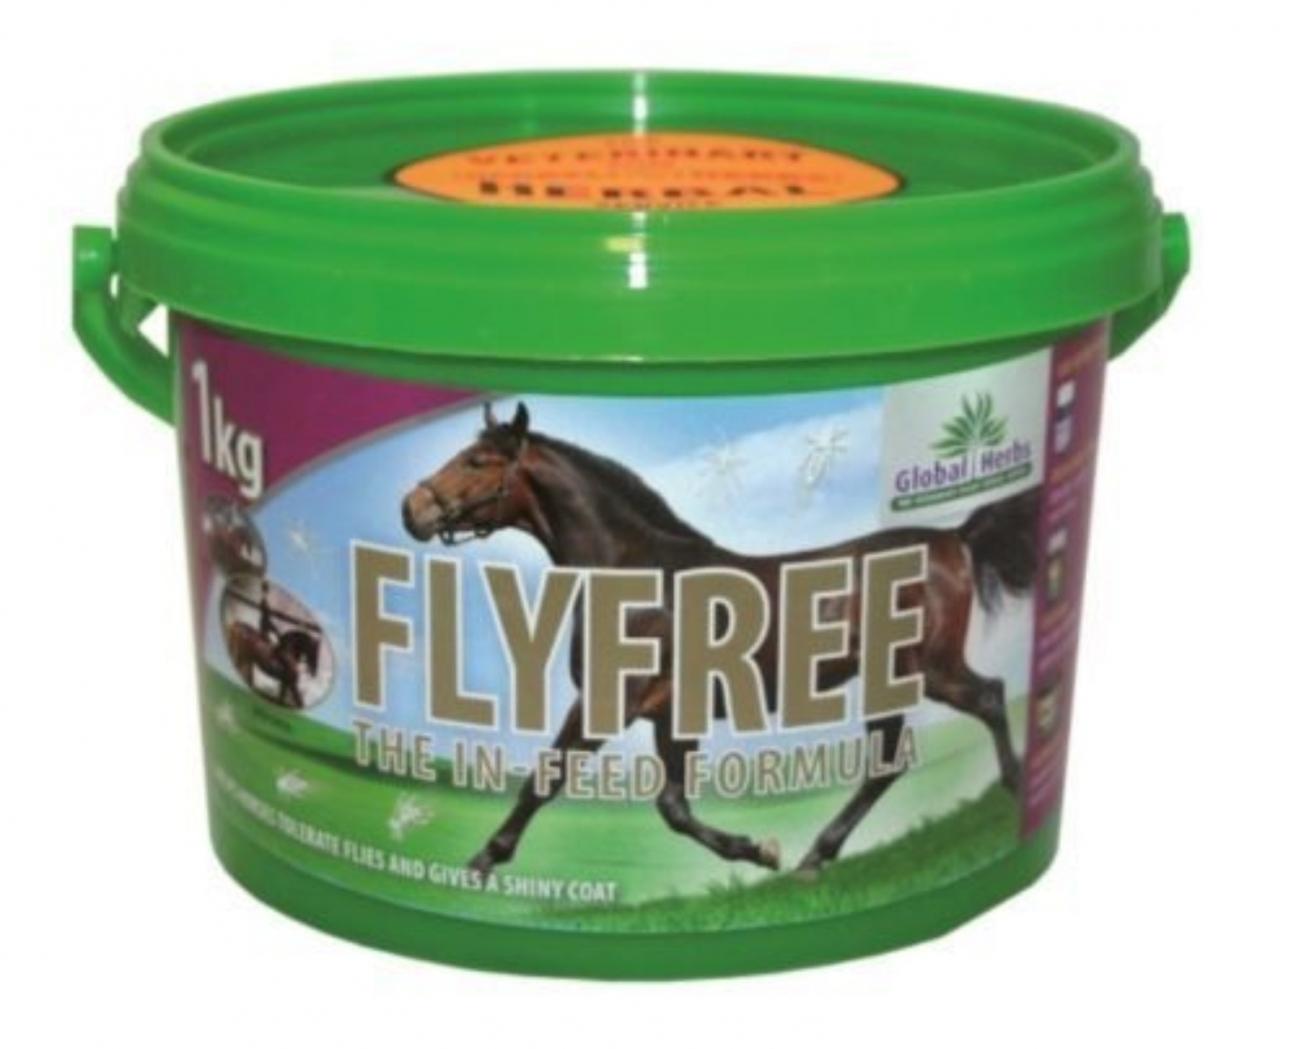 Global Herbs Fly Free